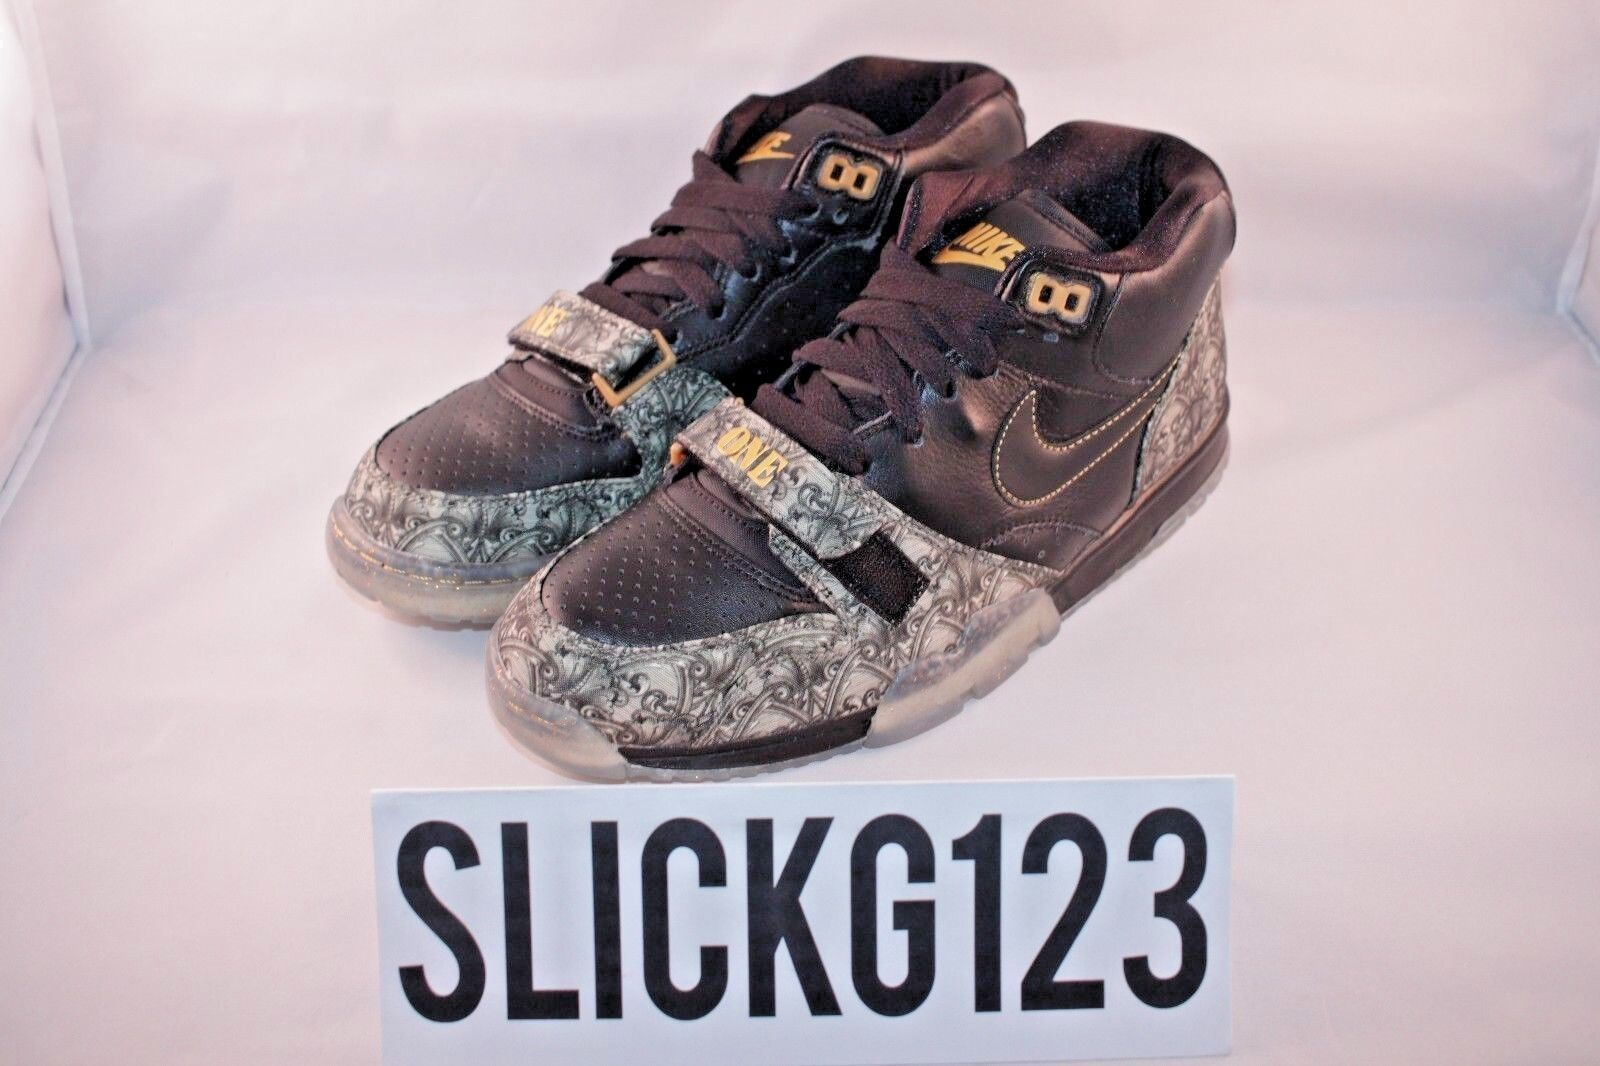 Nike Air Trainer 1 Bo Bo Bo Jackson Premium QS Paid in Full Size 9.5 DS Brand New w Rc c2c083